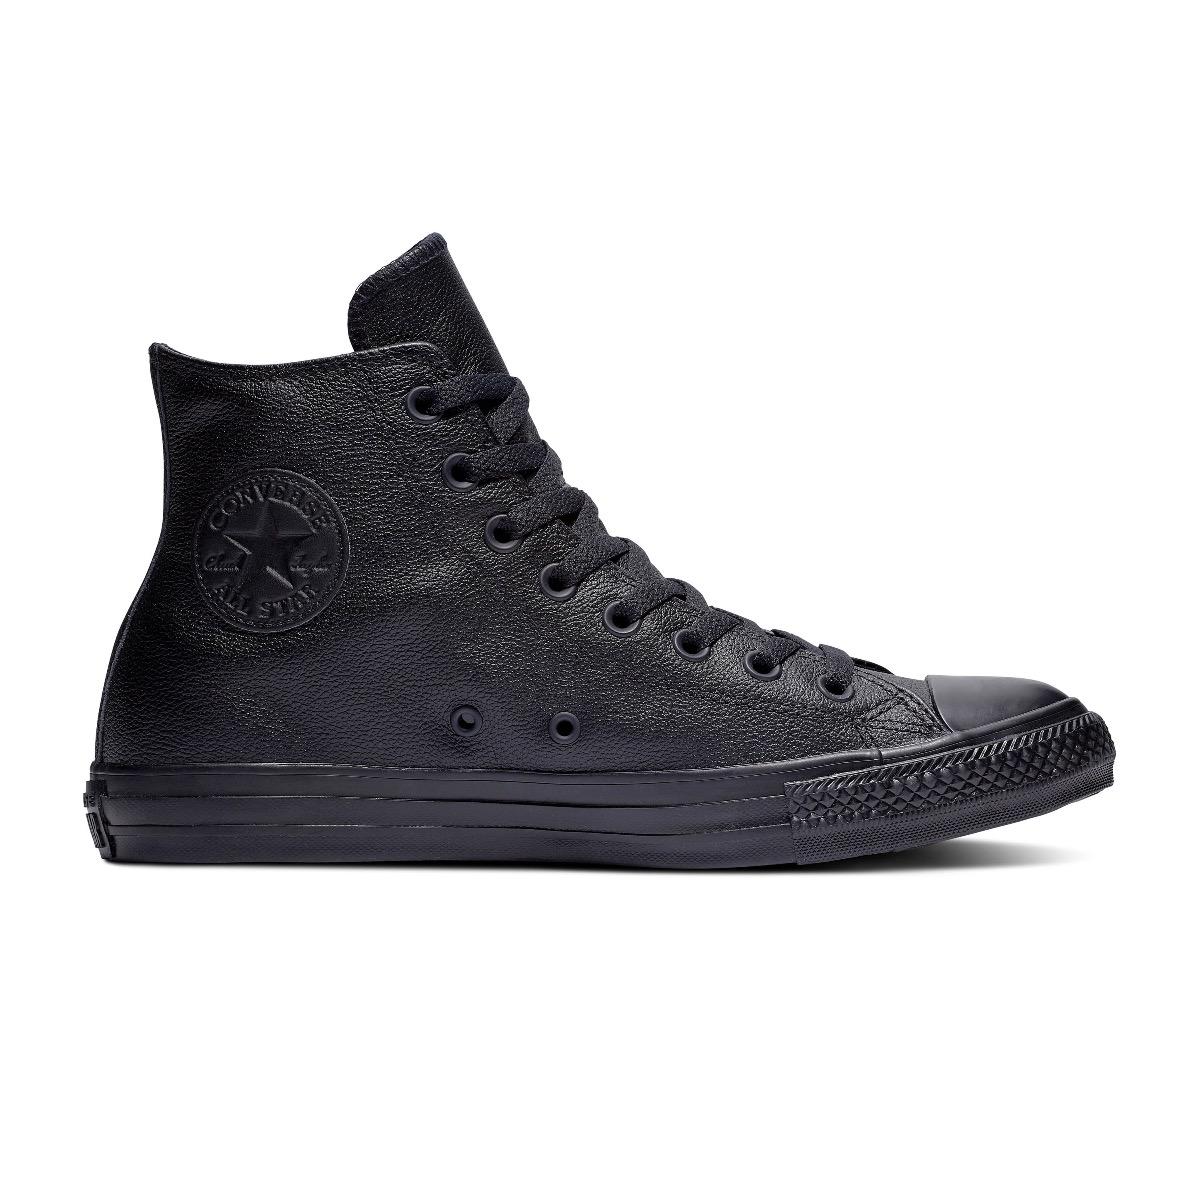 Converse All Stars Leather Hoog 135251C Zwart-38 maat 38